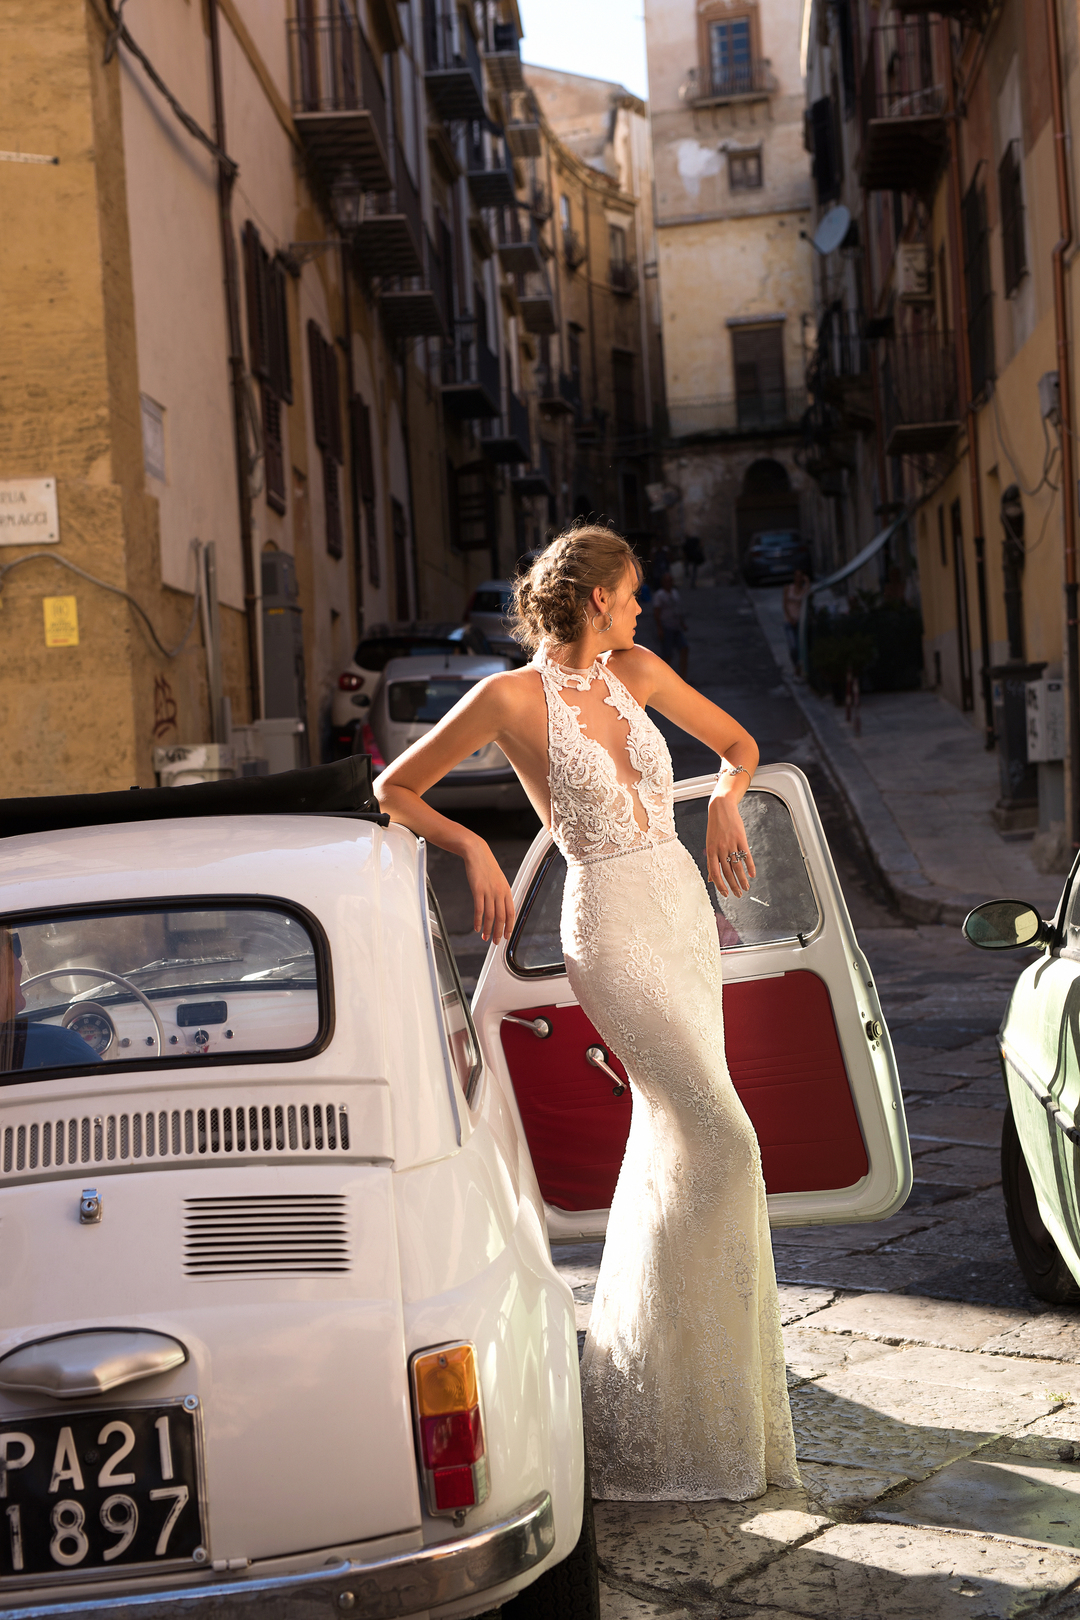 brianna dress photo